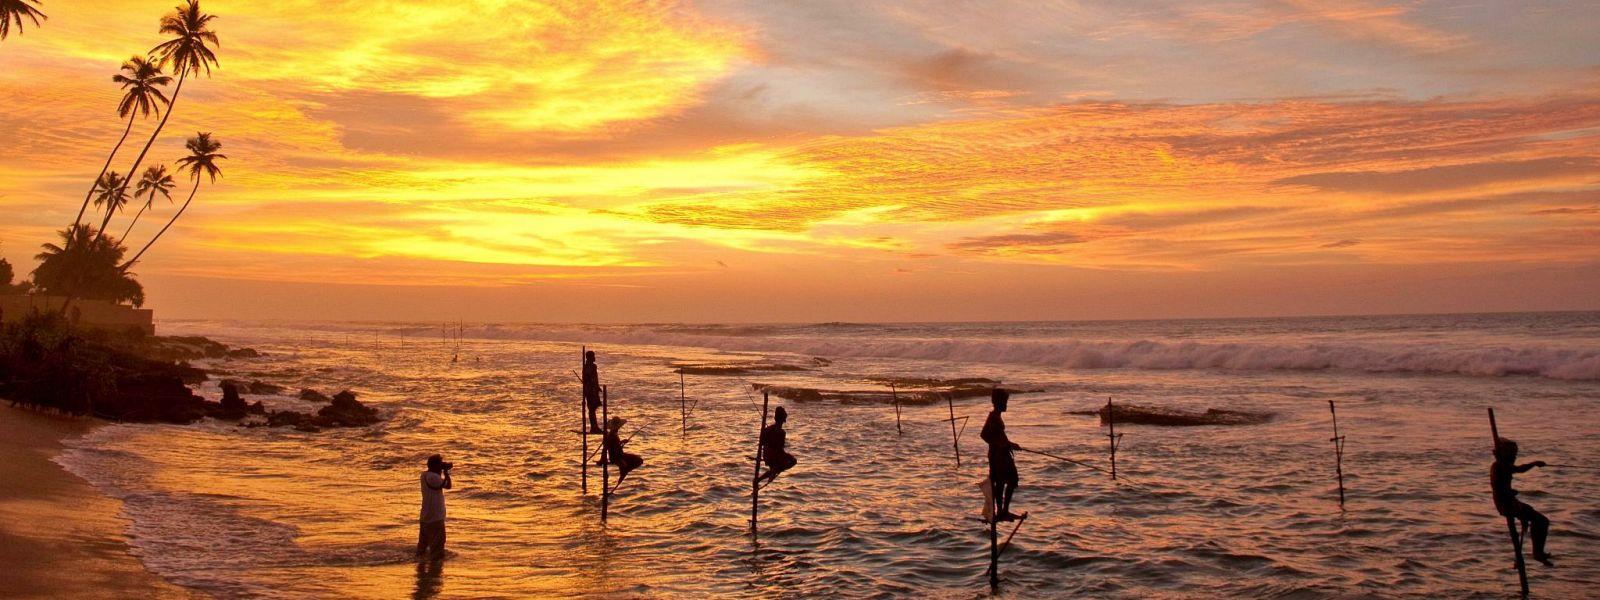 Ihre Betreuung in Sri Lanka